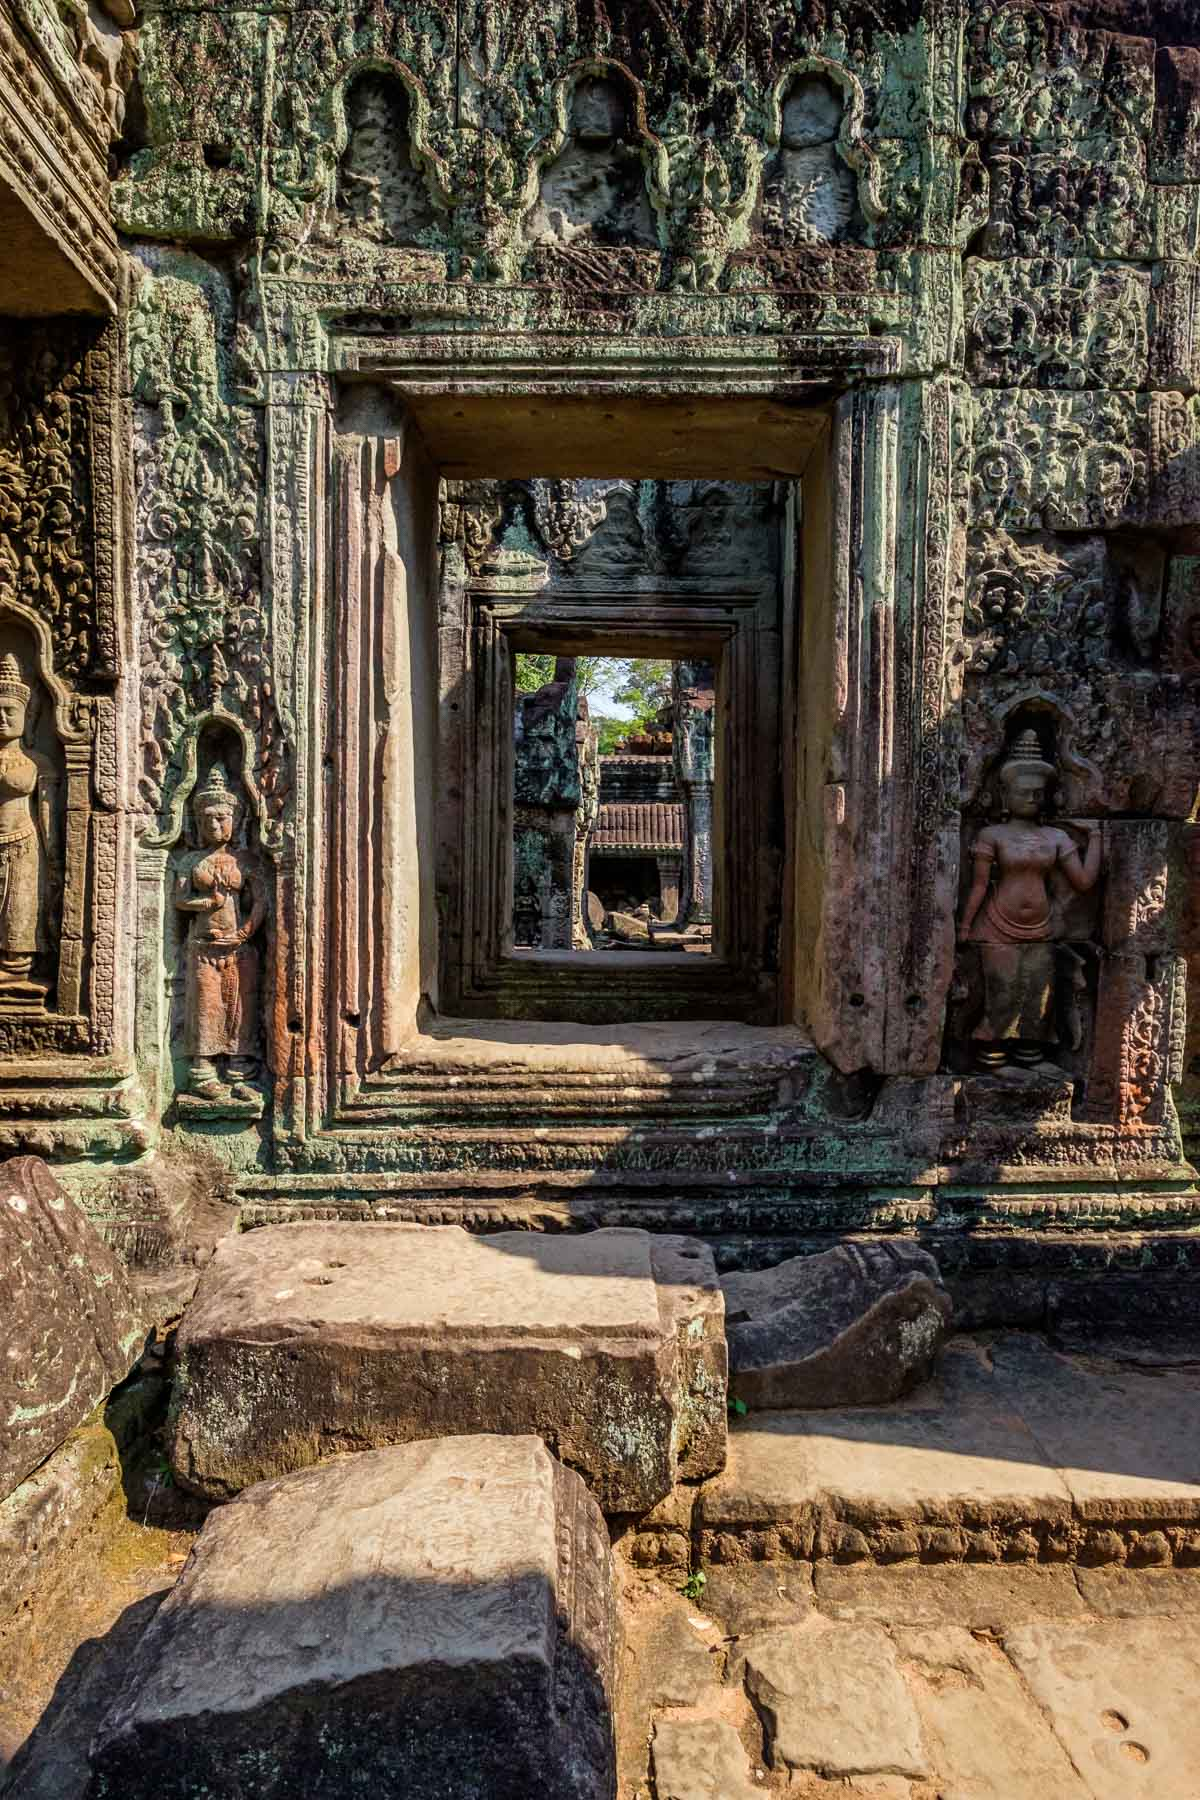 Carved wall sculptures at Preah Khan